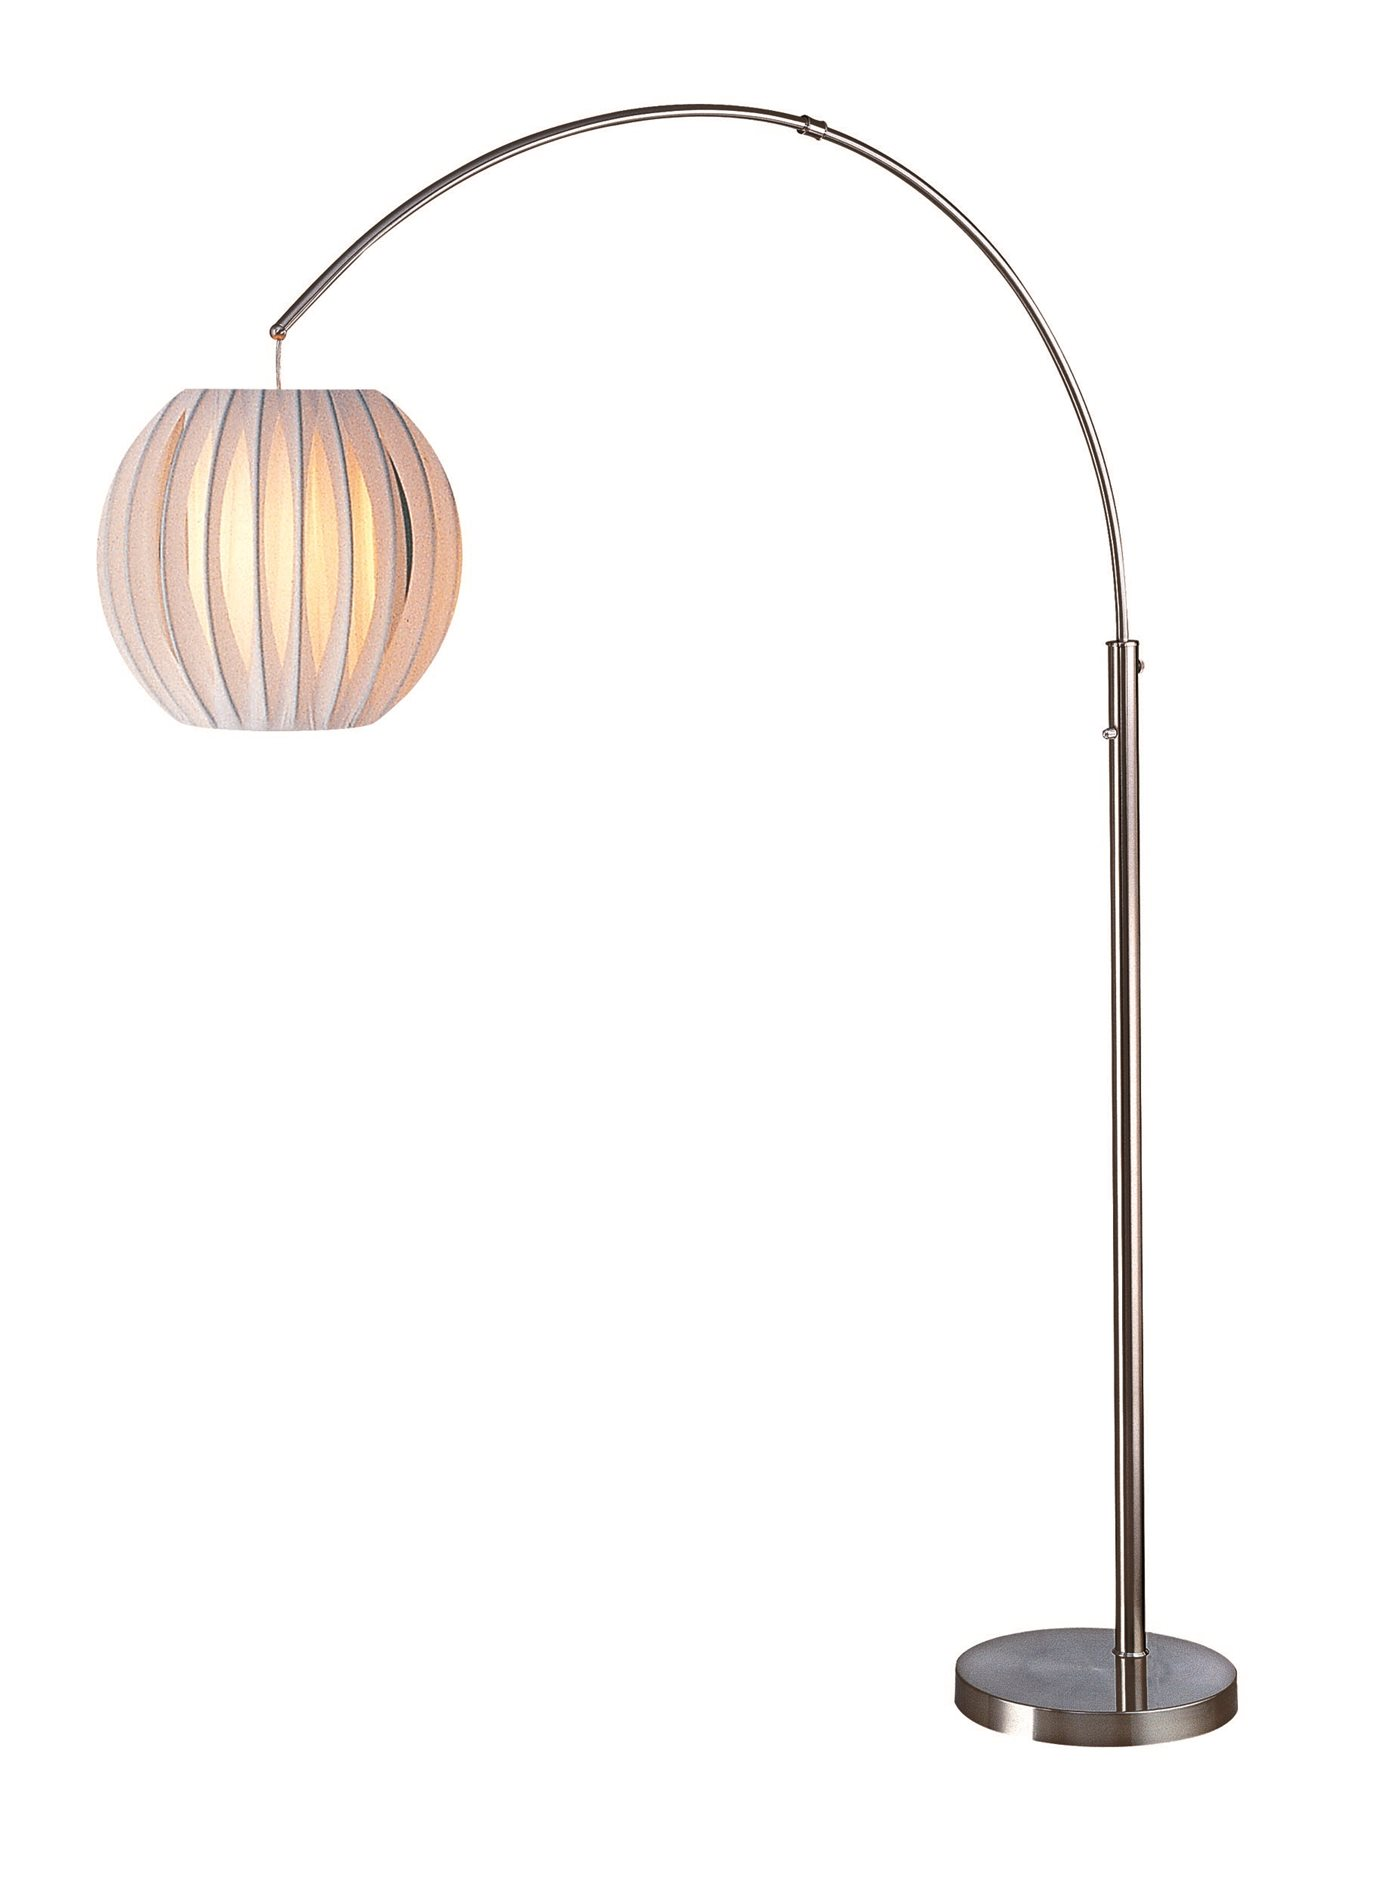 lite source ls 8870ps wht deion contemporary arc floor. Black Bedroom Furniture Sets. Home Design Ideas